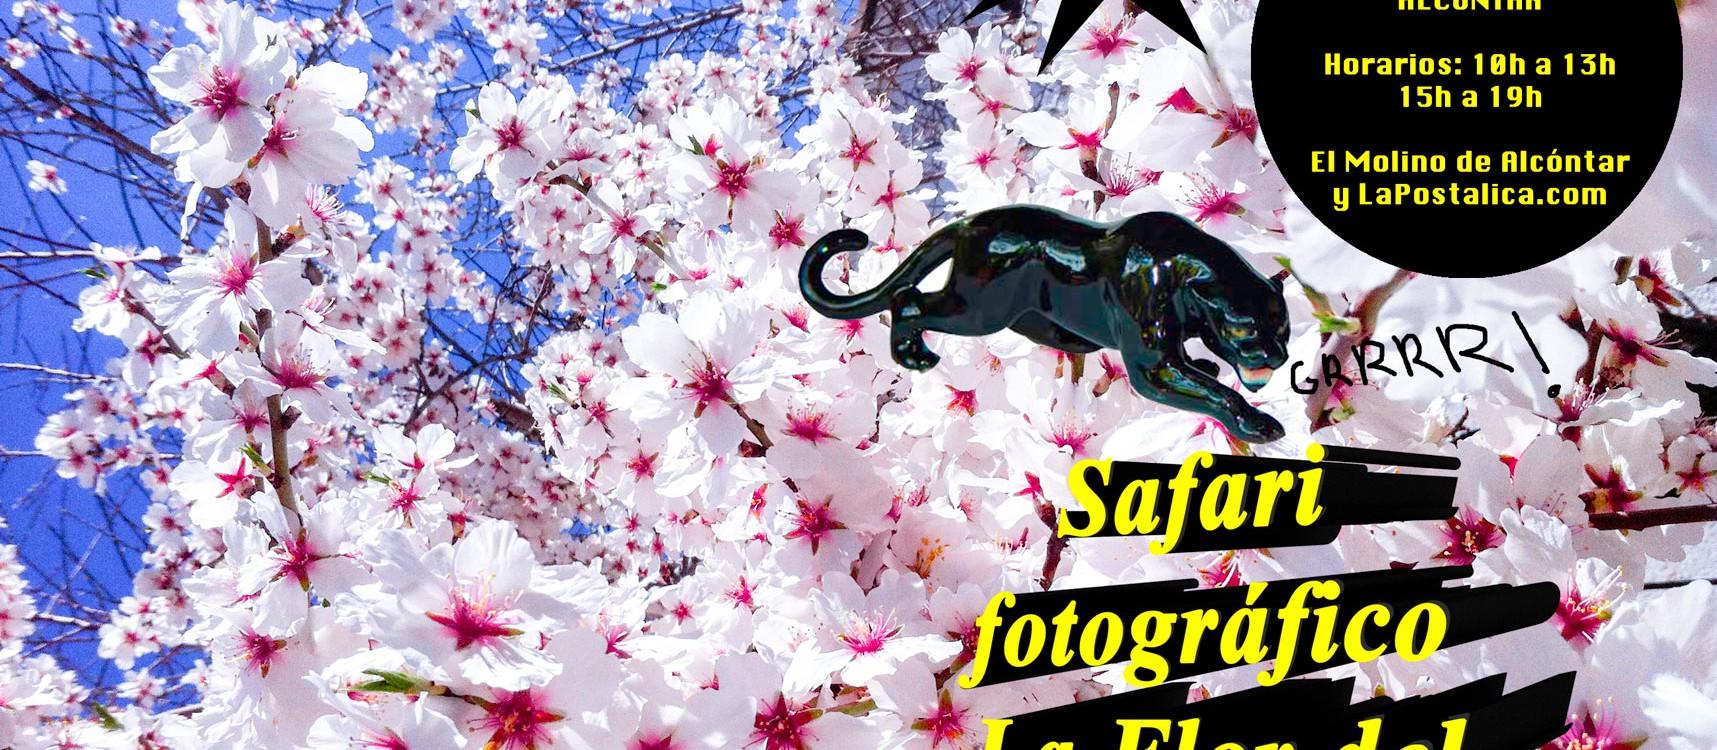 Safari fotográfico La Flor del Almendro